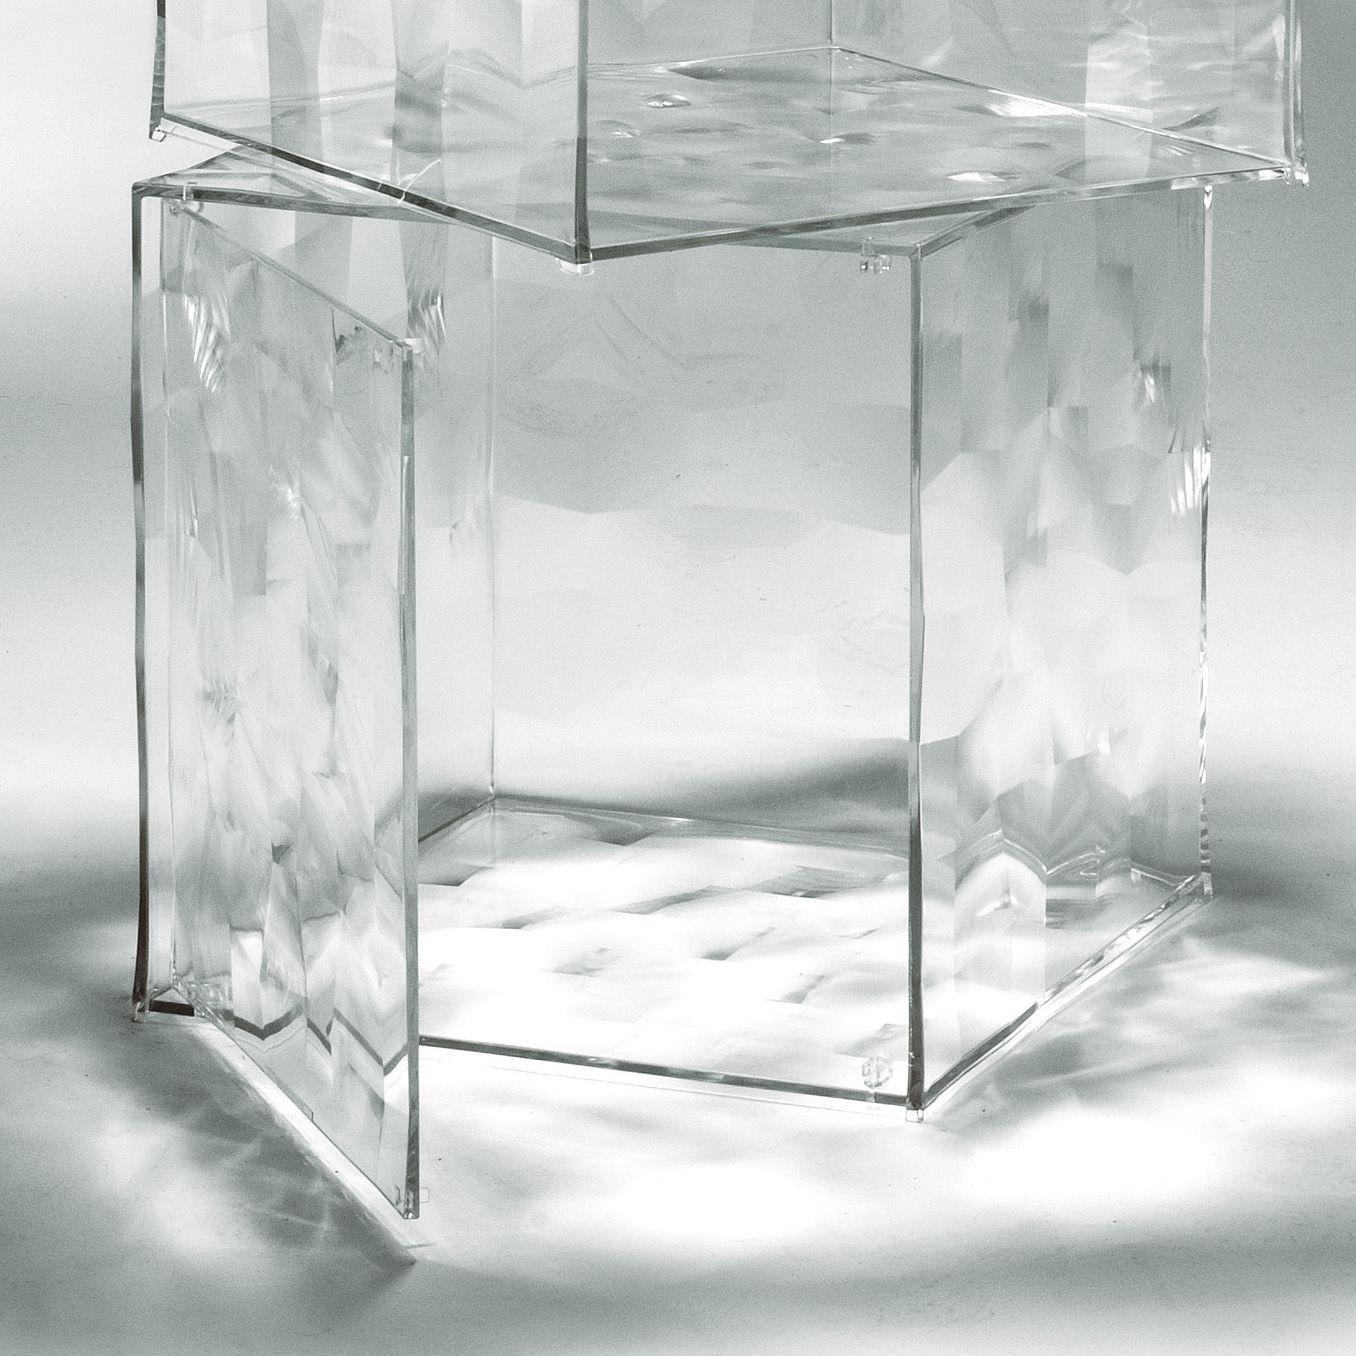 Mobilier - Tables basses - Rangement Optic avec porte - Kartell - Cristal transparent - PMMA